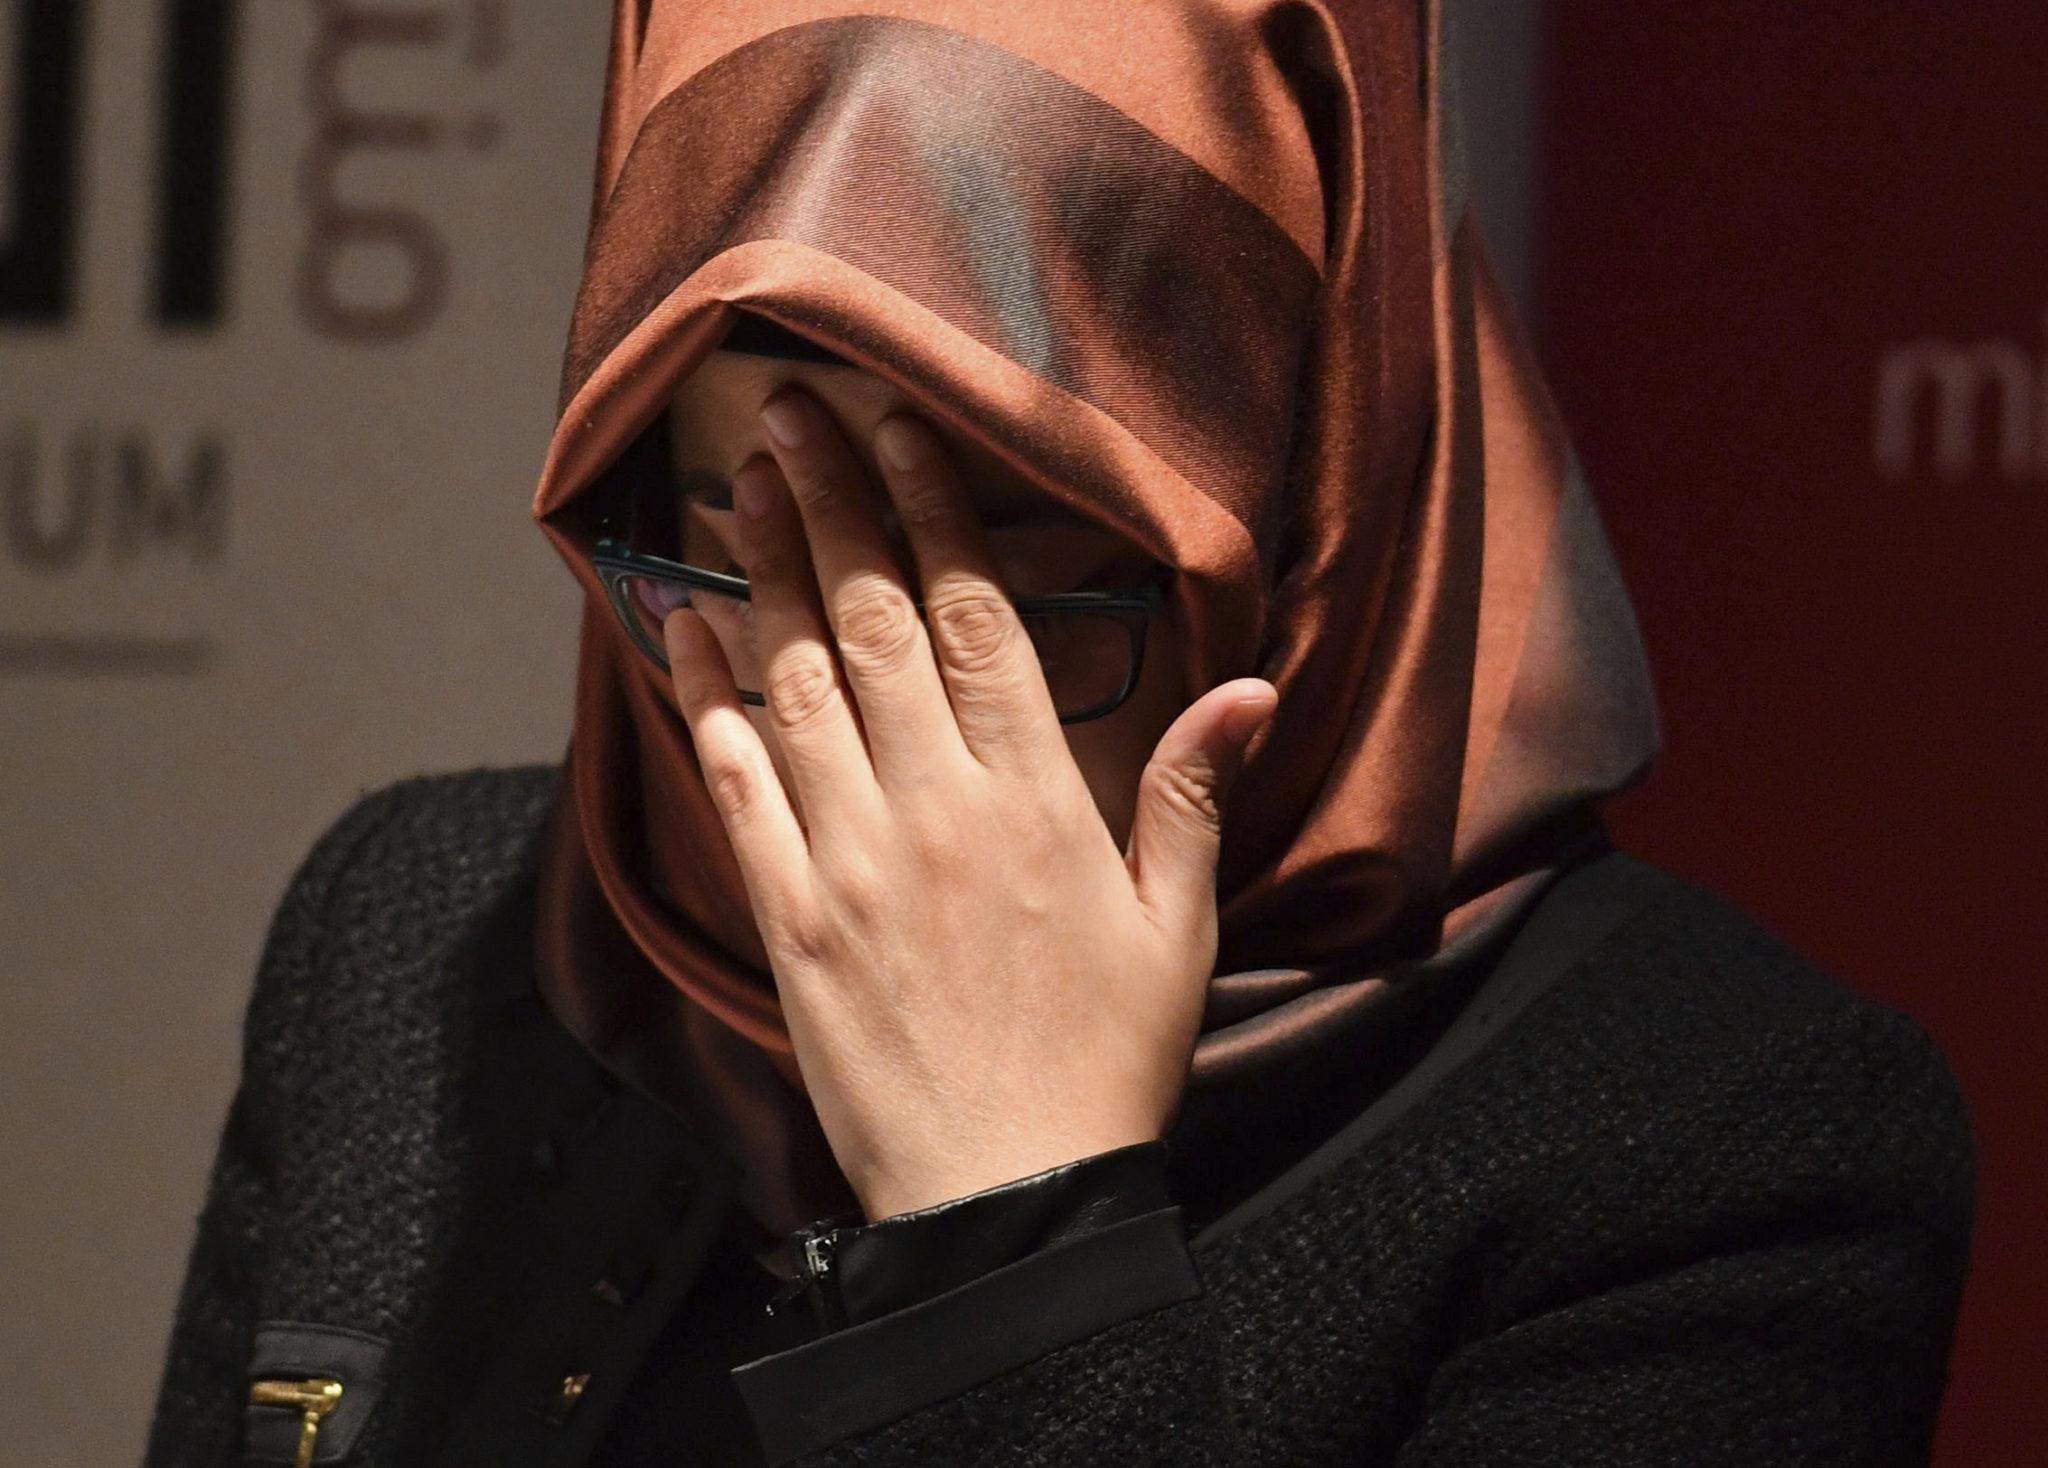 Khashoggi's Fiancee Calls On Trump To Prevent 'Cover-Up'